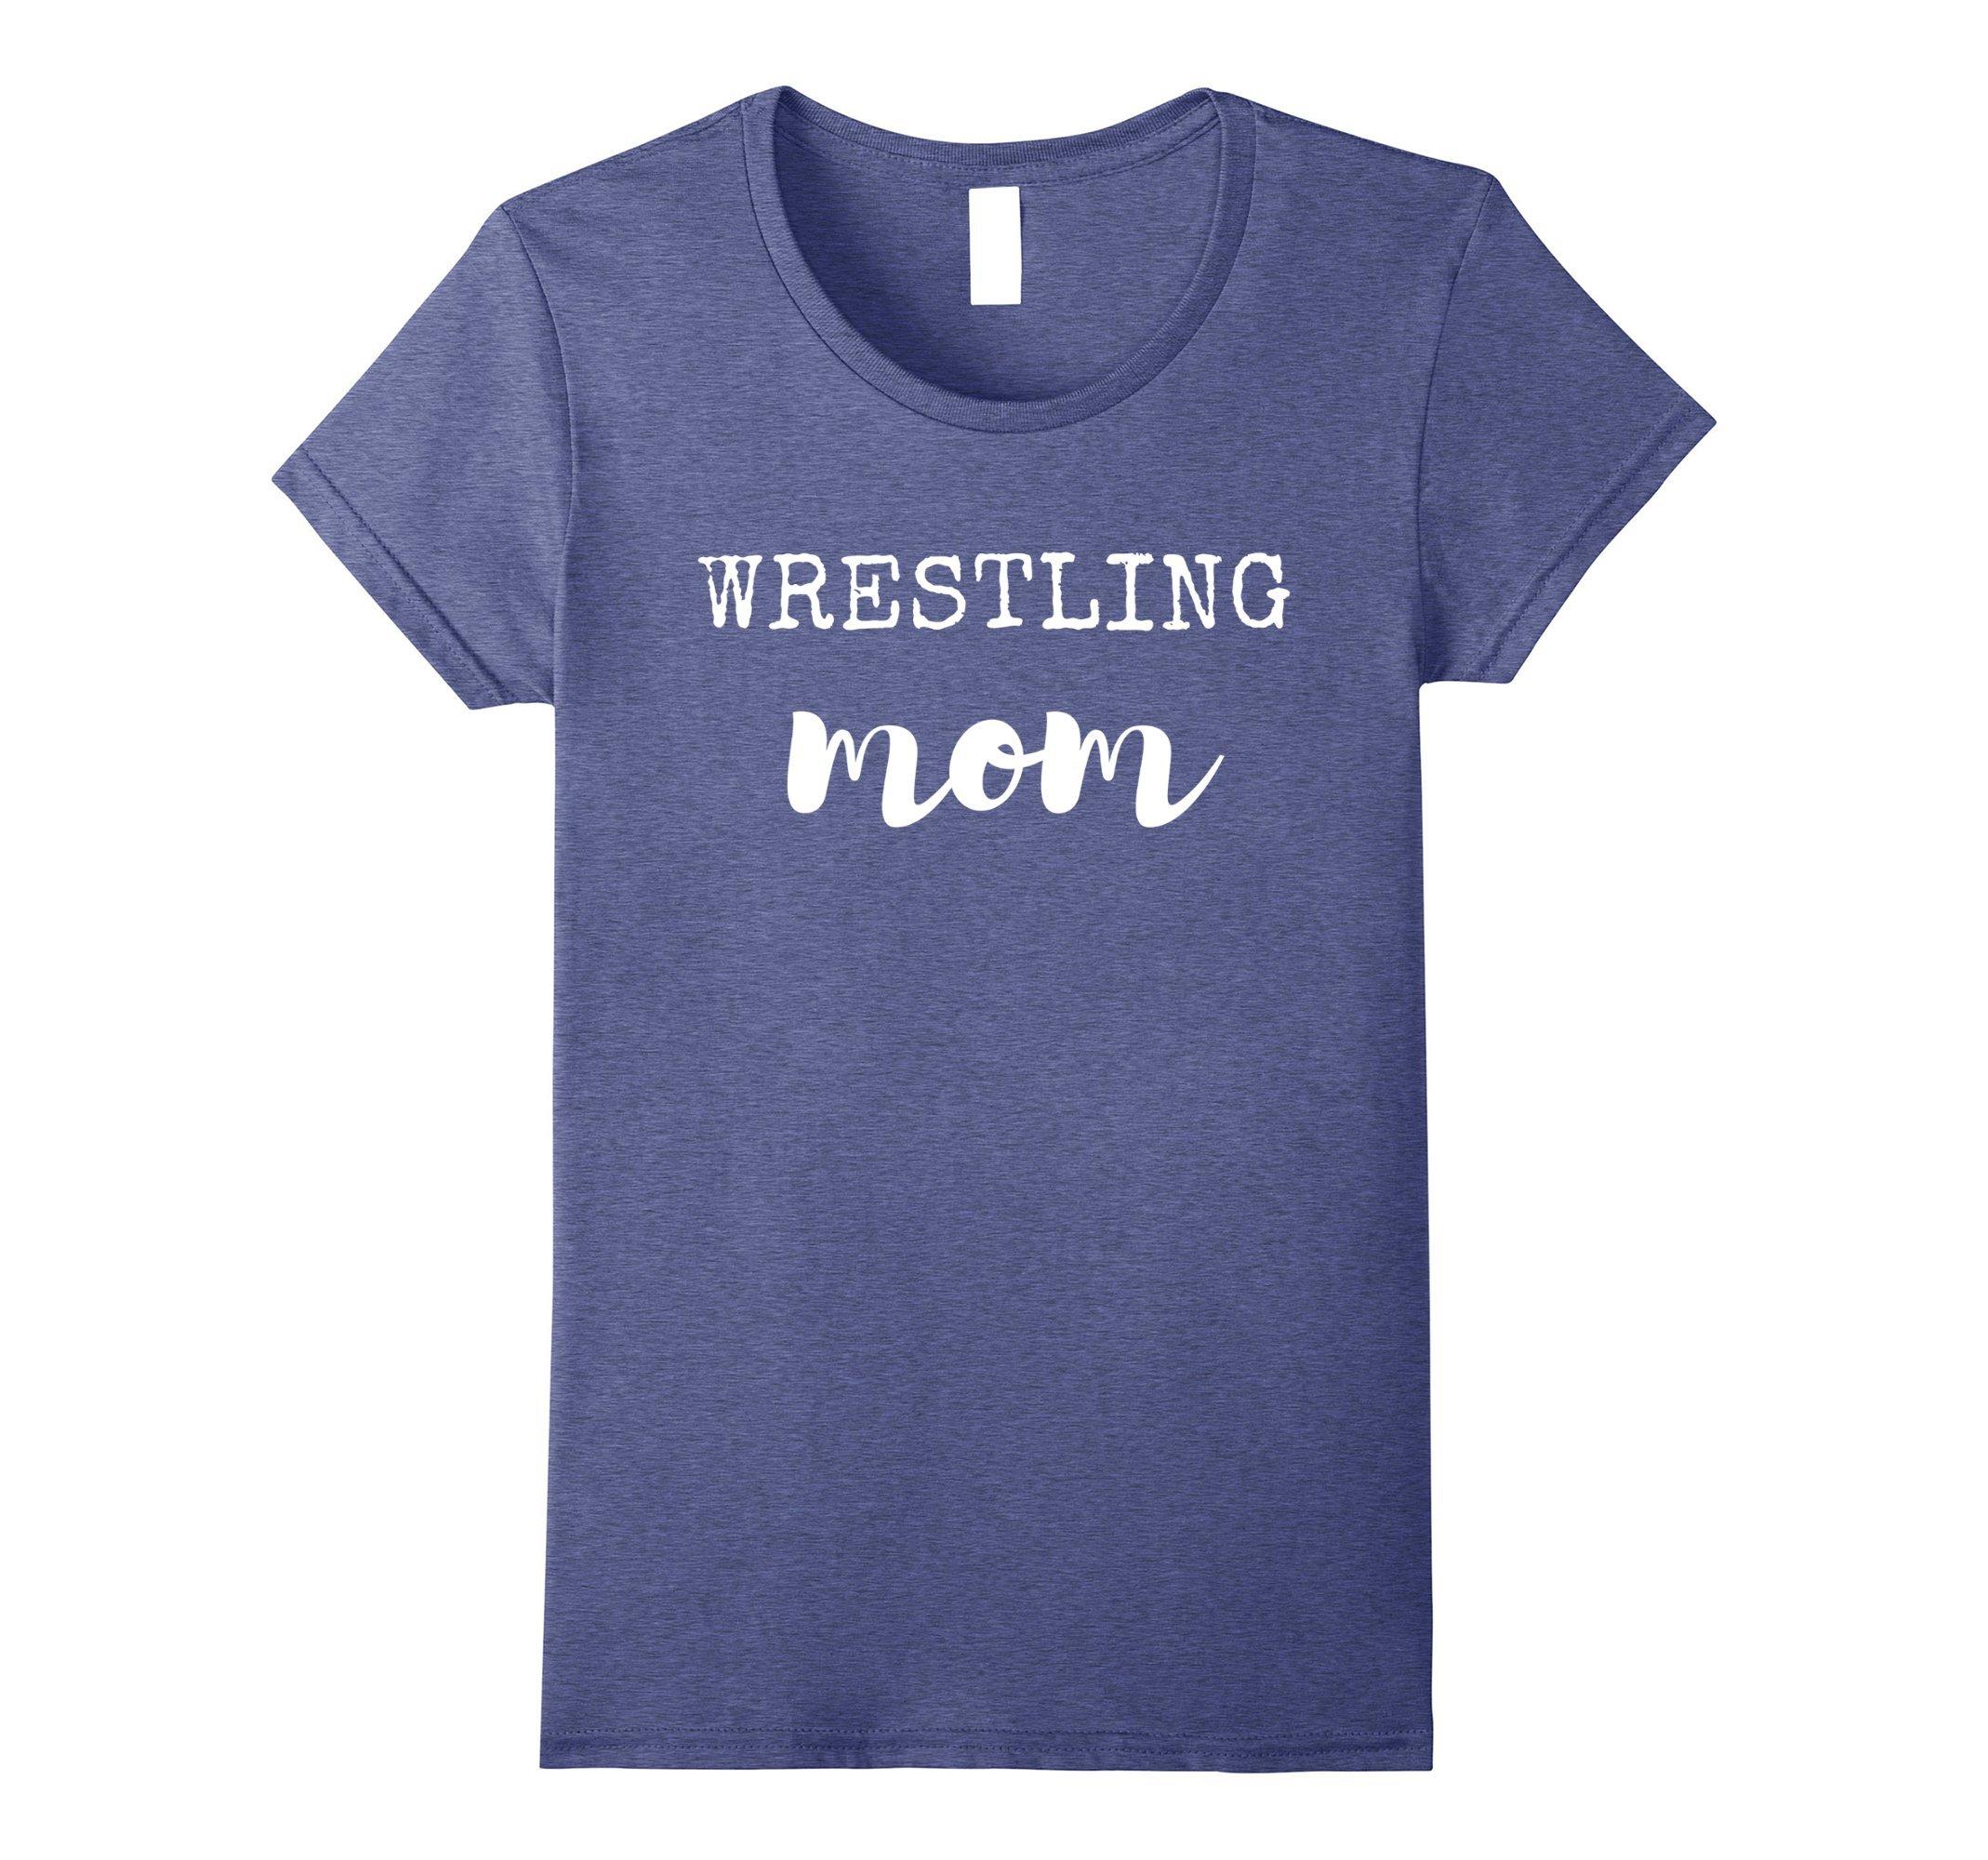 Womens Wrestling Mom T-Shirt for Women Medium Heather Blue by Wrestling Family Tees